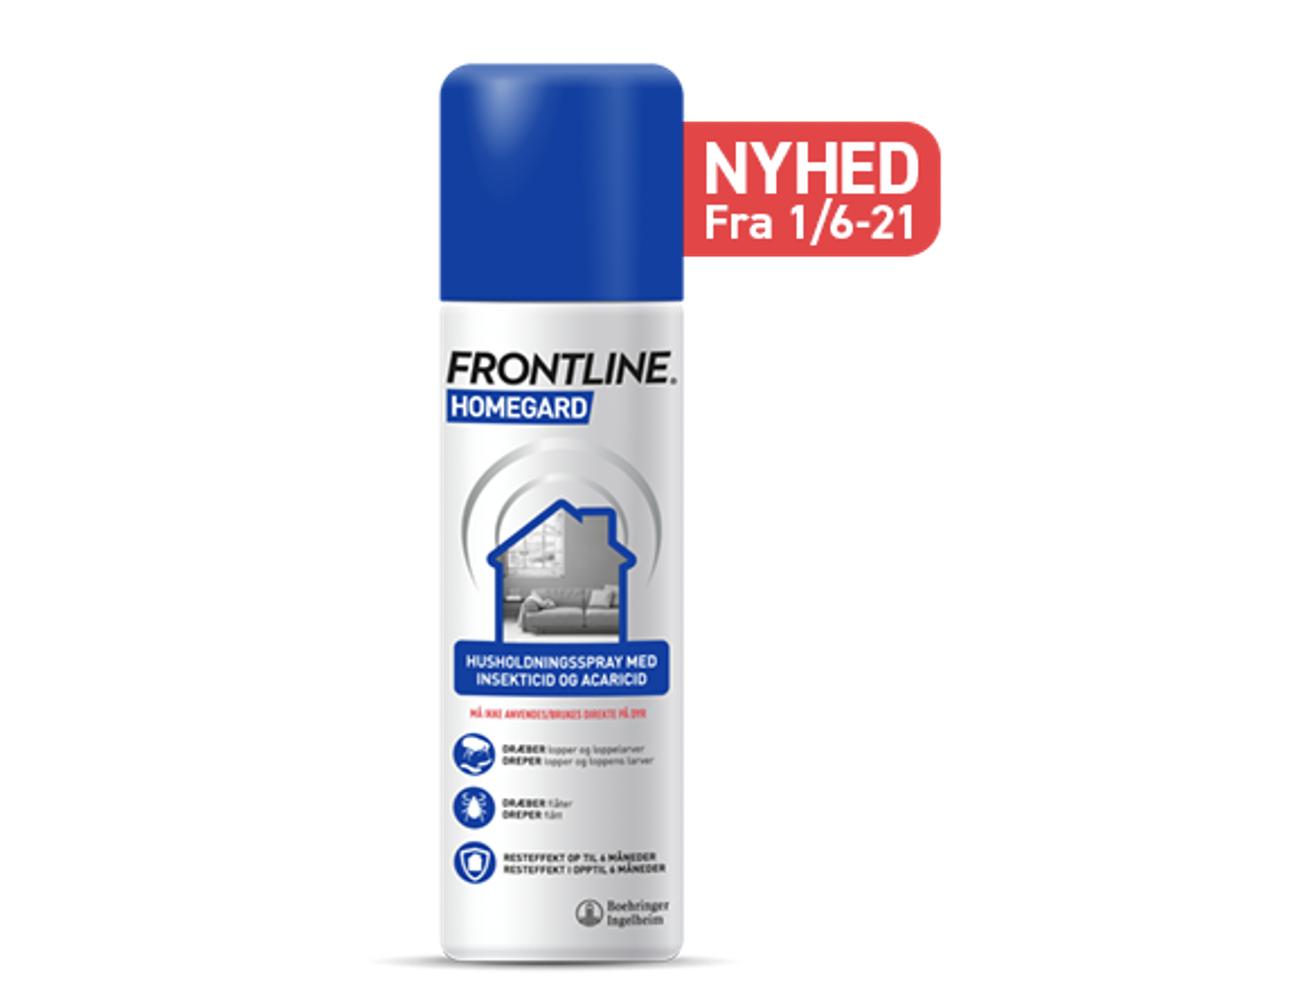 Befri dit hjem med Frontline HomeGard